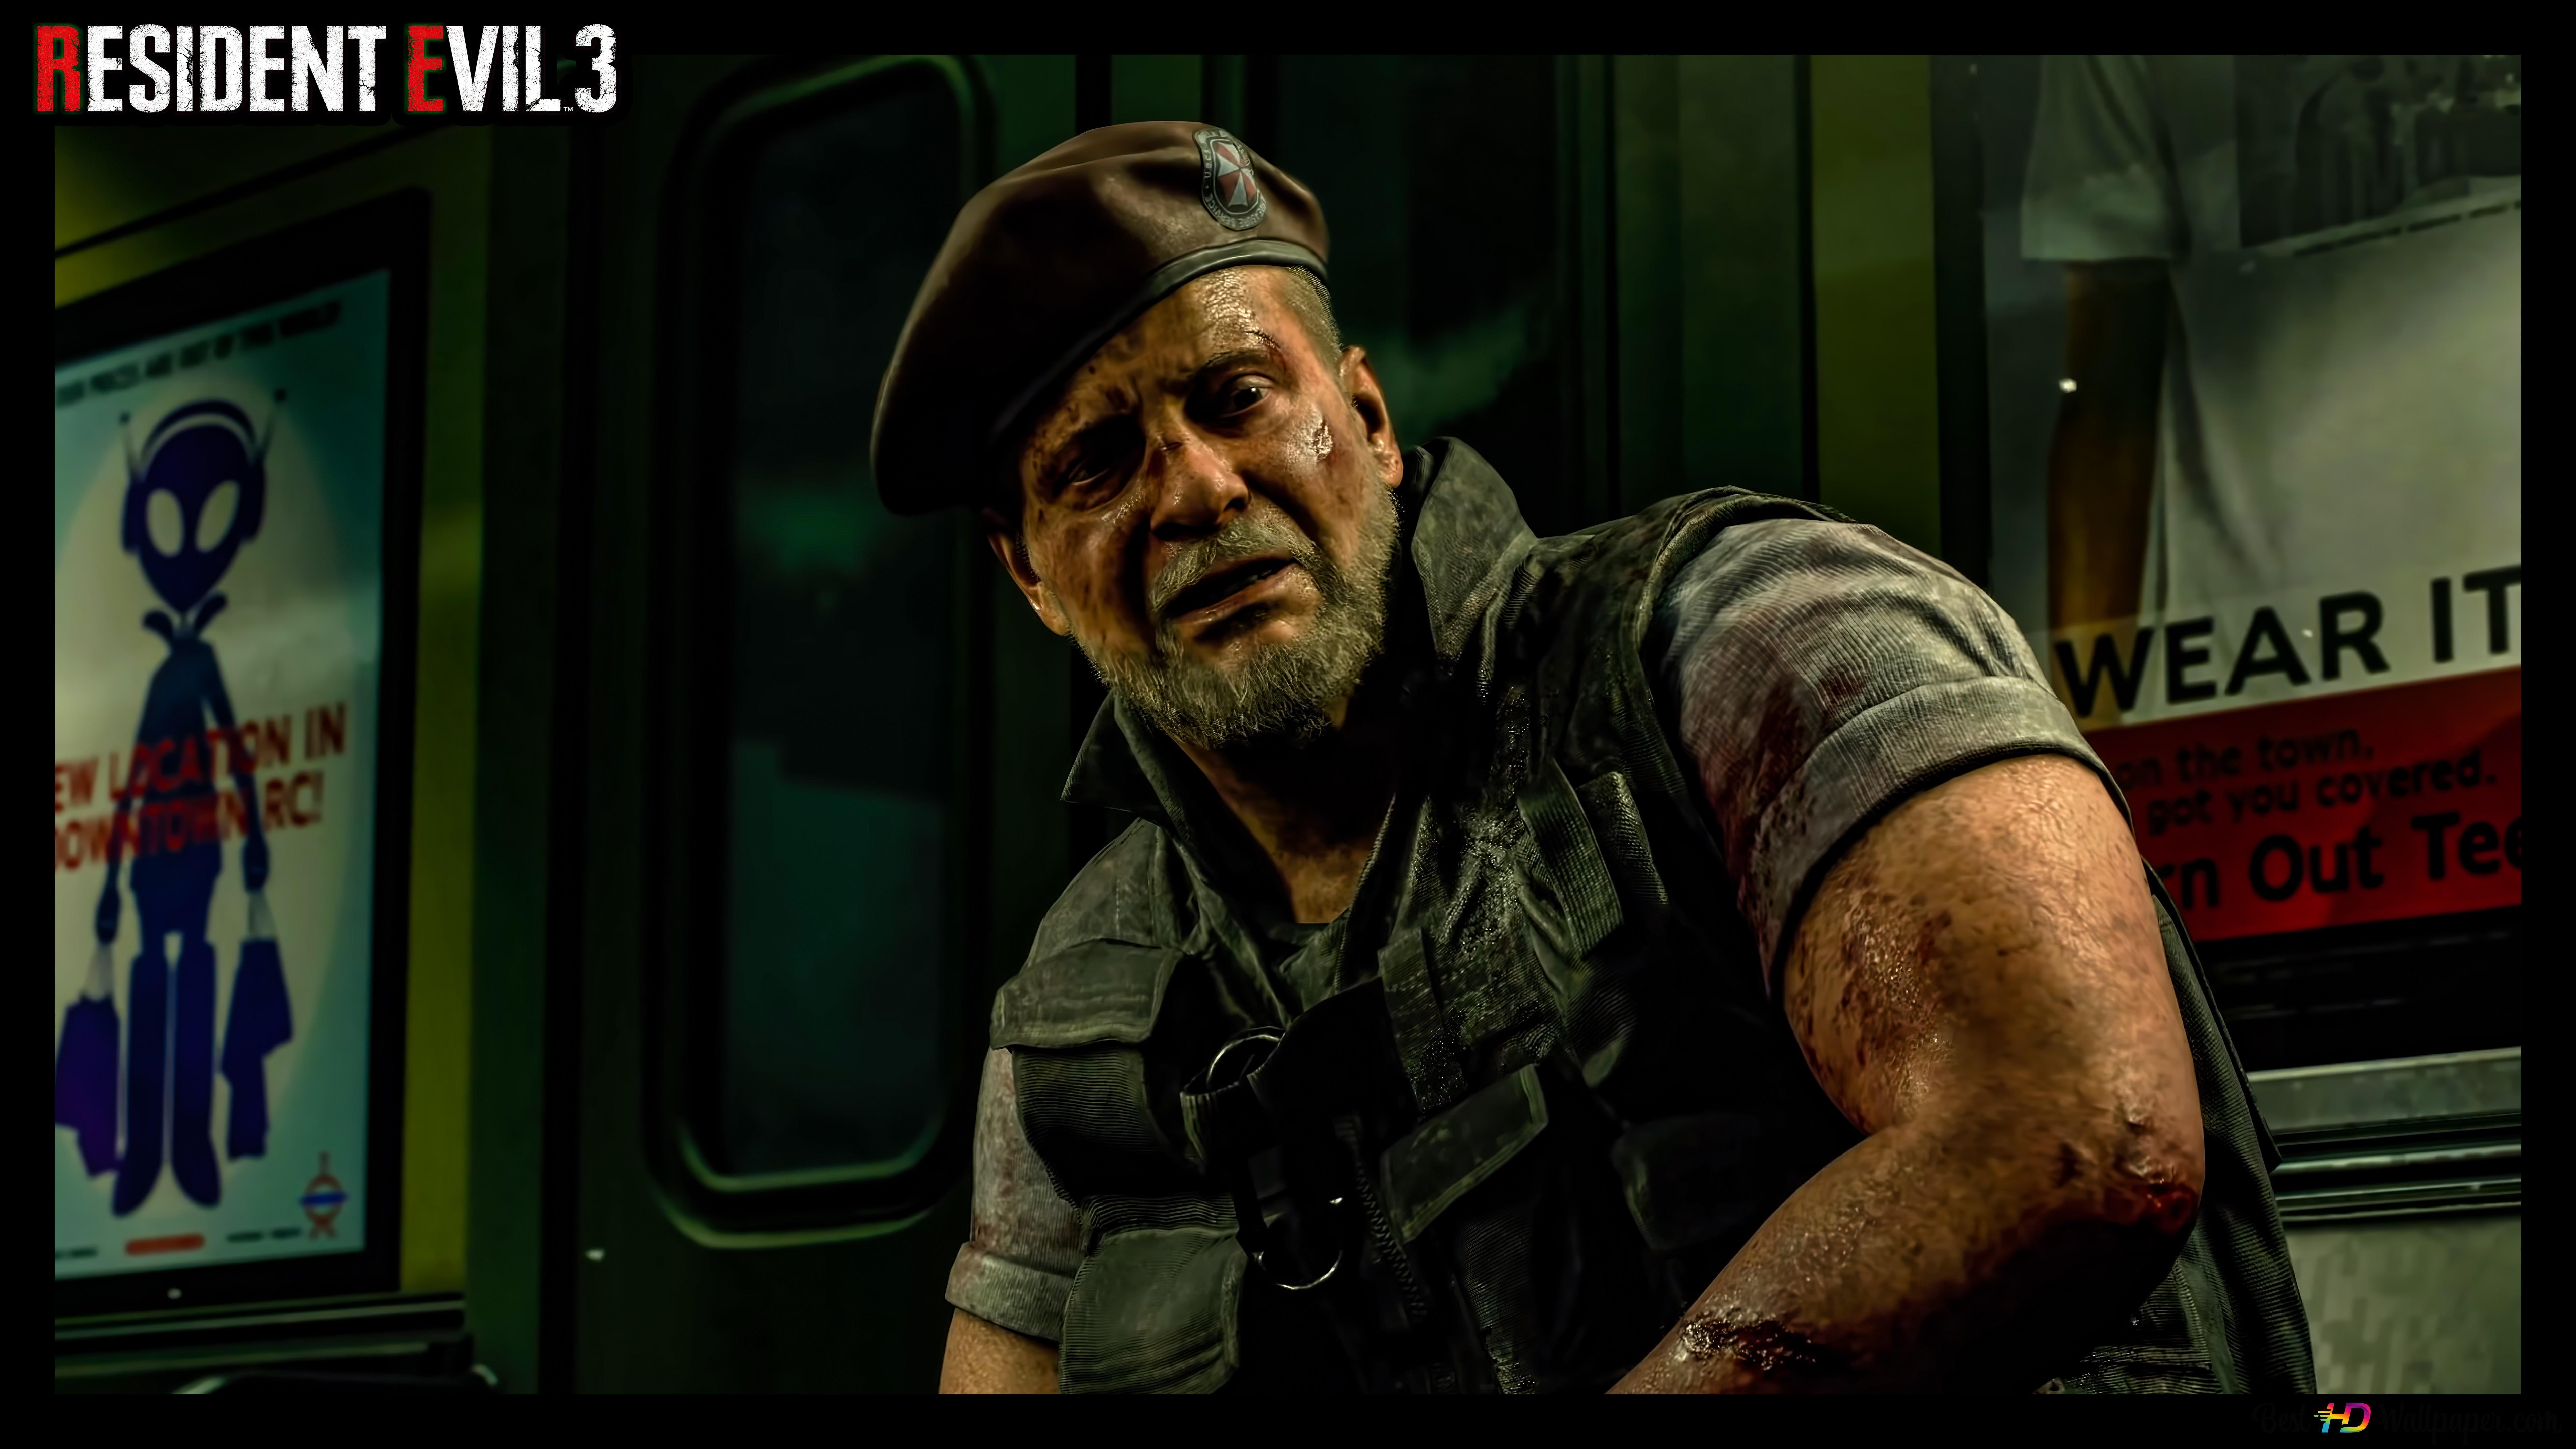 Resident Evil 3 Remake 08 8k 4k Wallpaper Hd Wallpaper Download